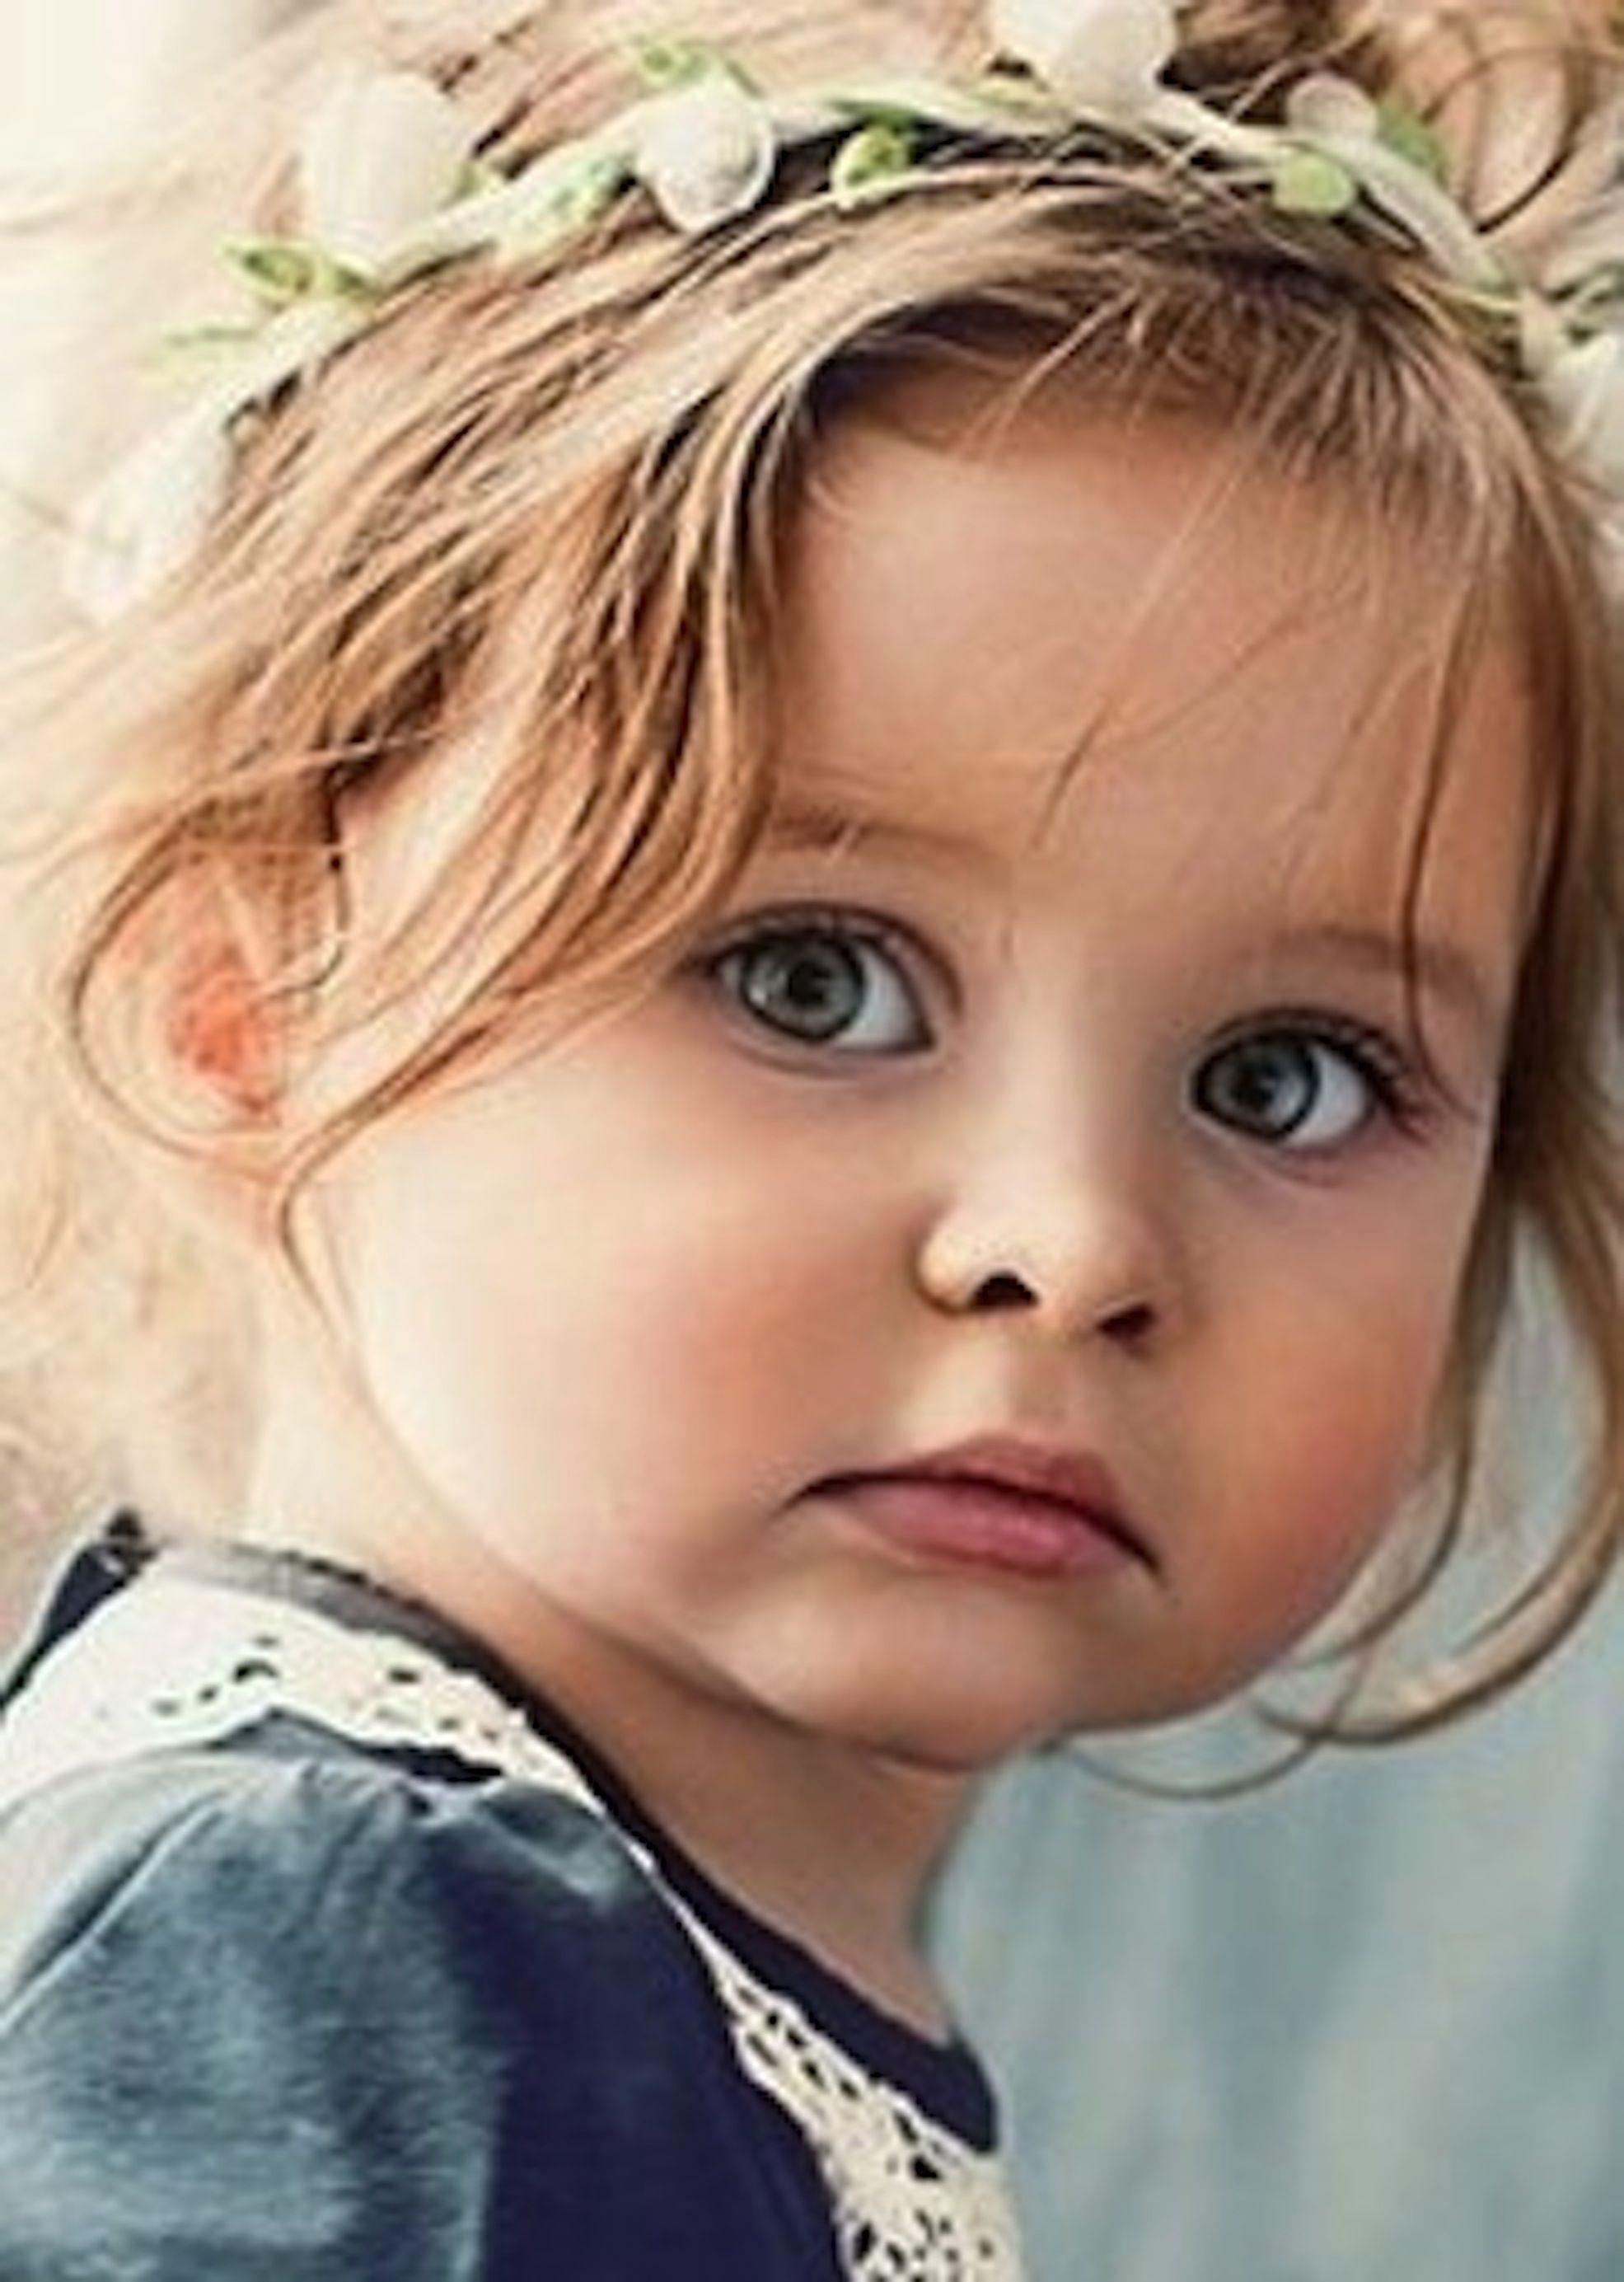 последствия дисплазии у ребенка фото